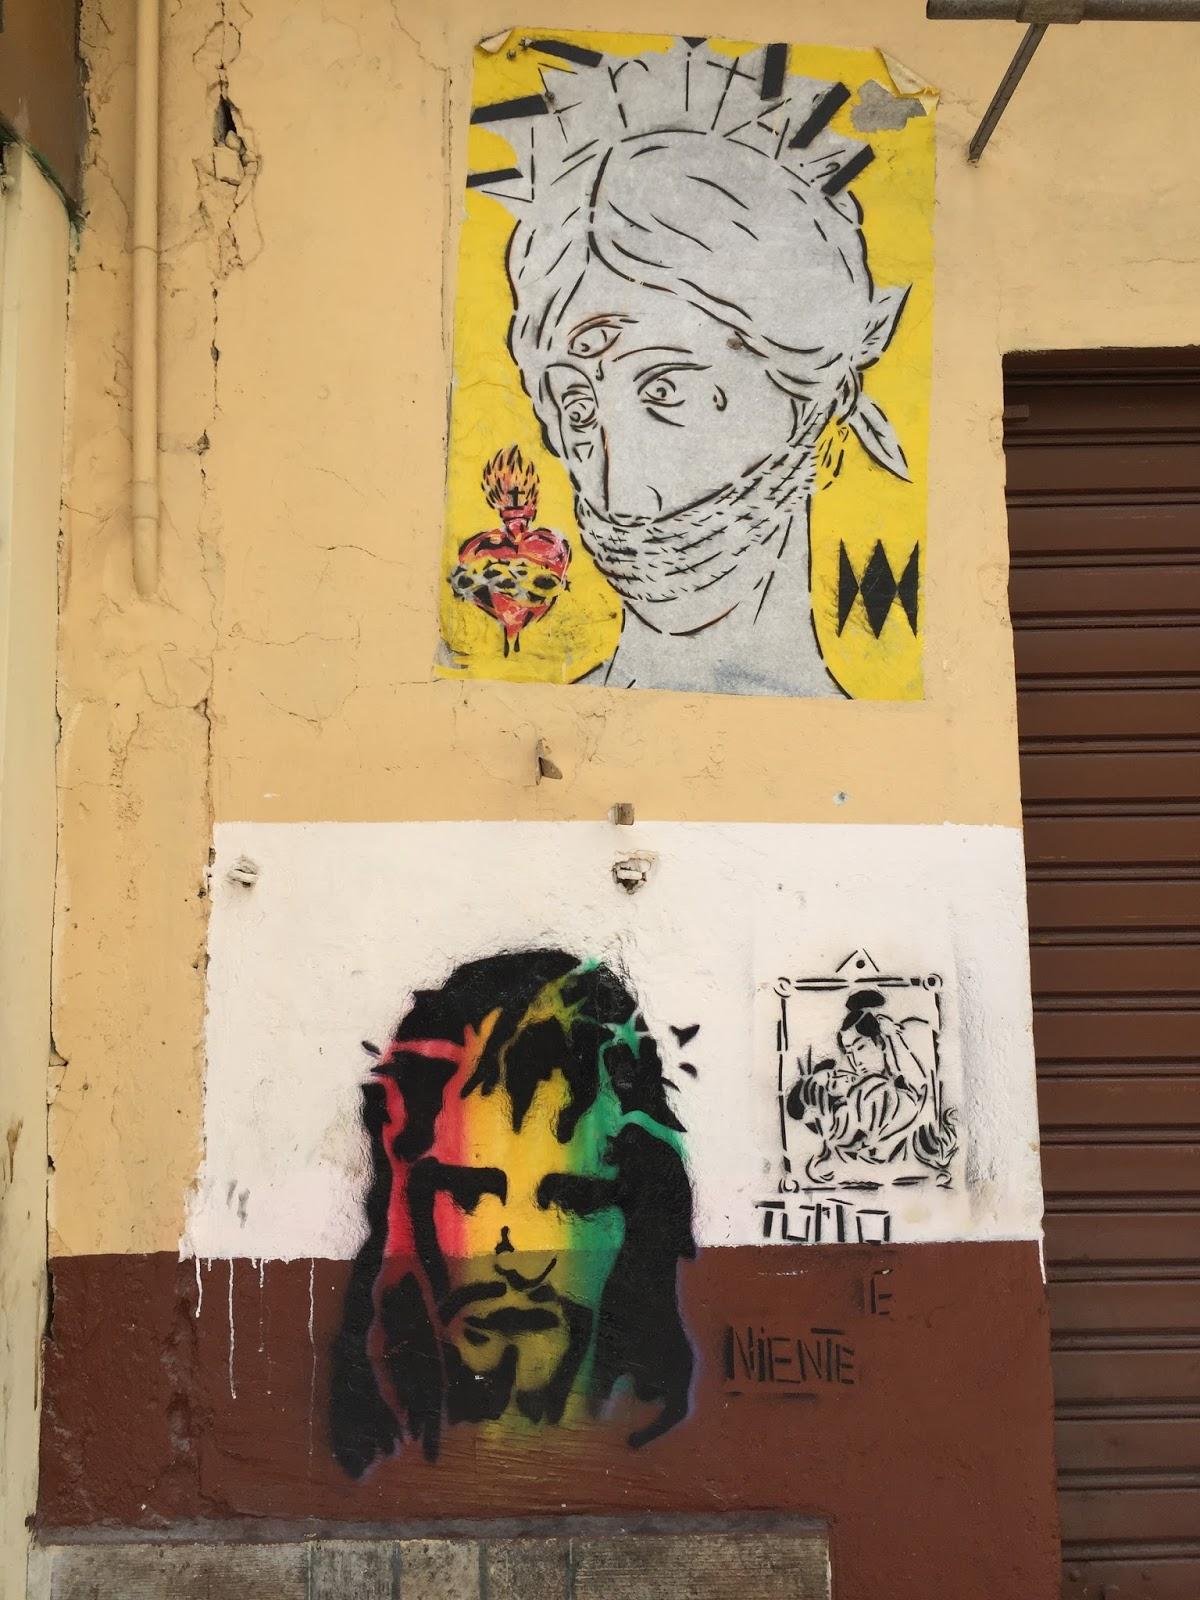 TravelMarx: Street Art from a Recent Trip to Sicily